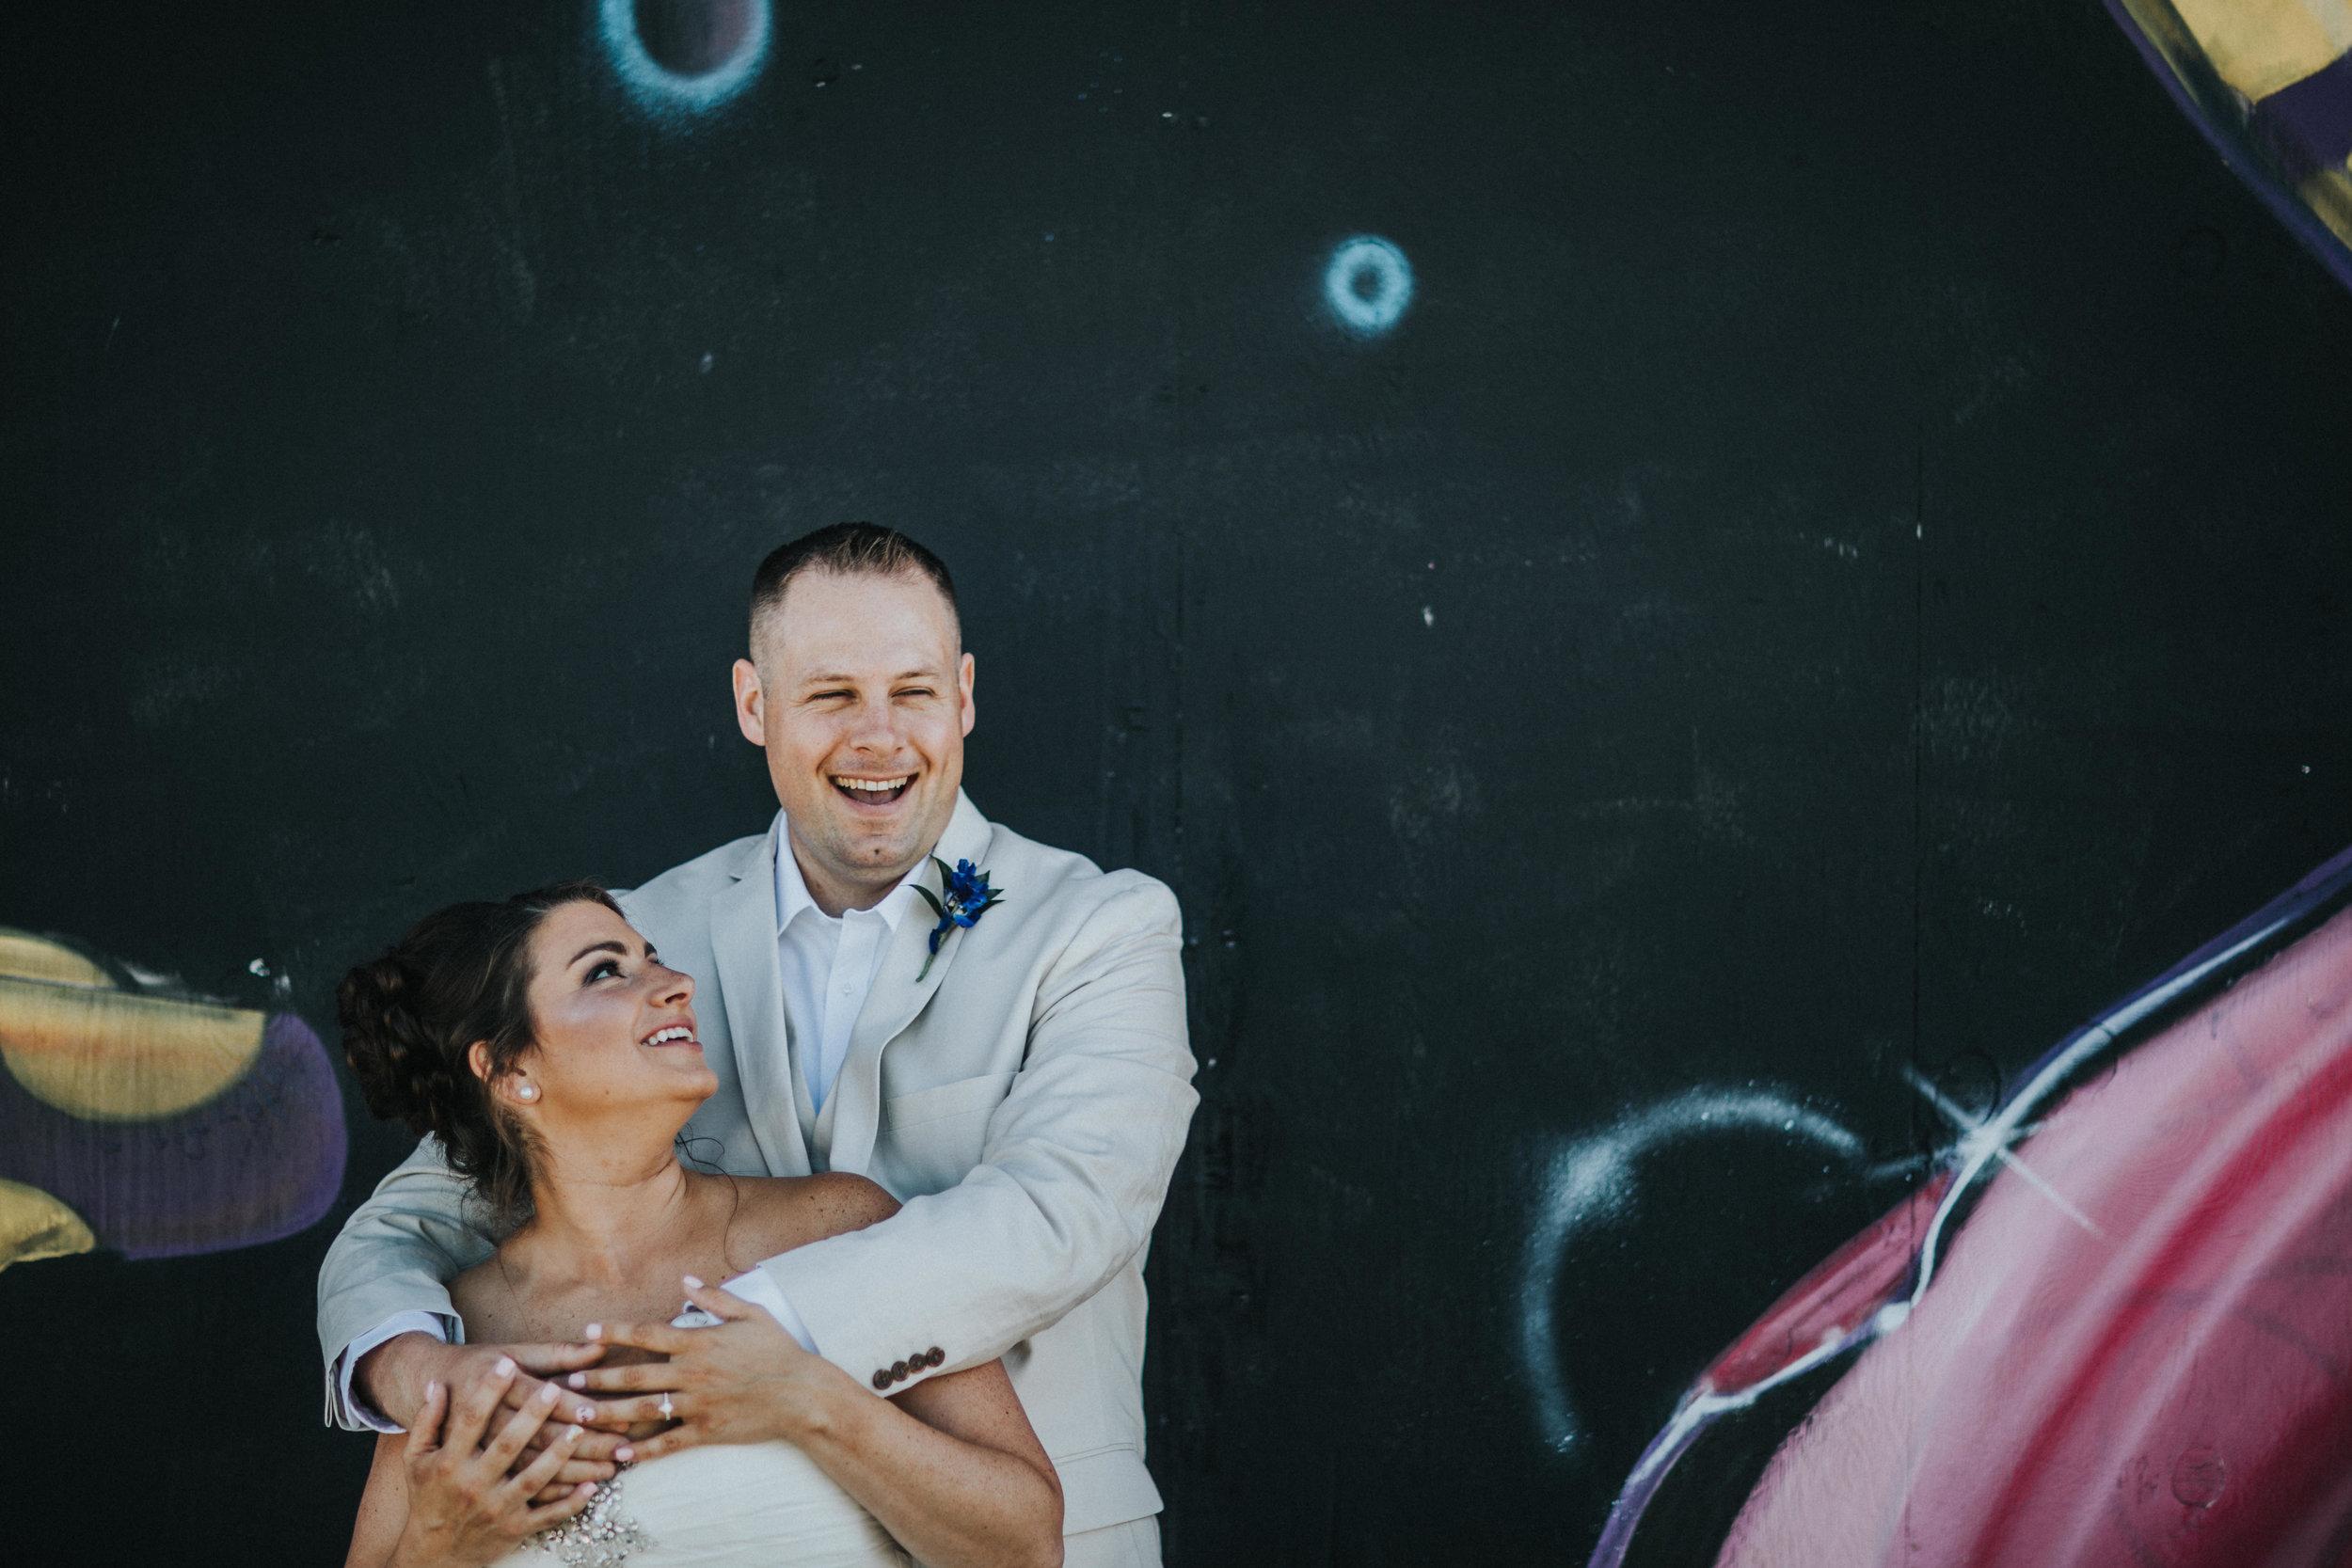 JennaLynnPhotography-NJWeddingPhotographer-Wedding-TheBerkeley-AsburyPark-Allison&Michael-Bride&Groom-60.jpg